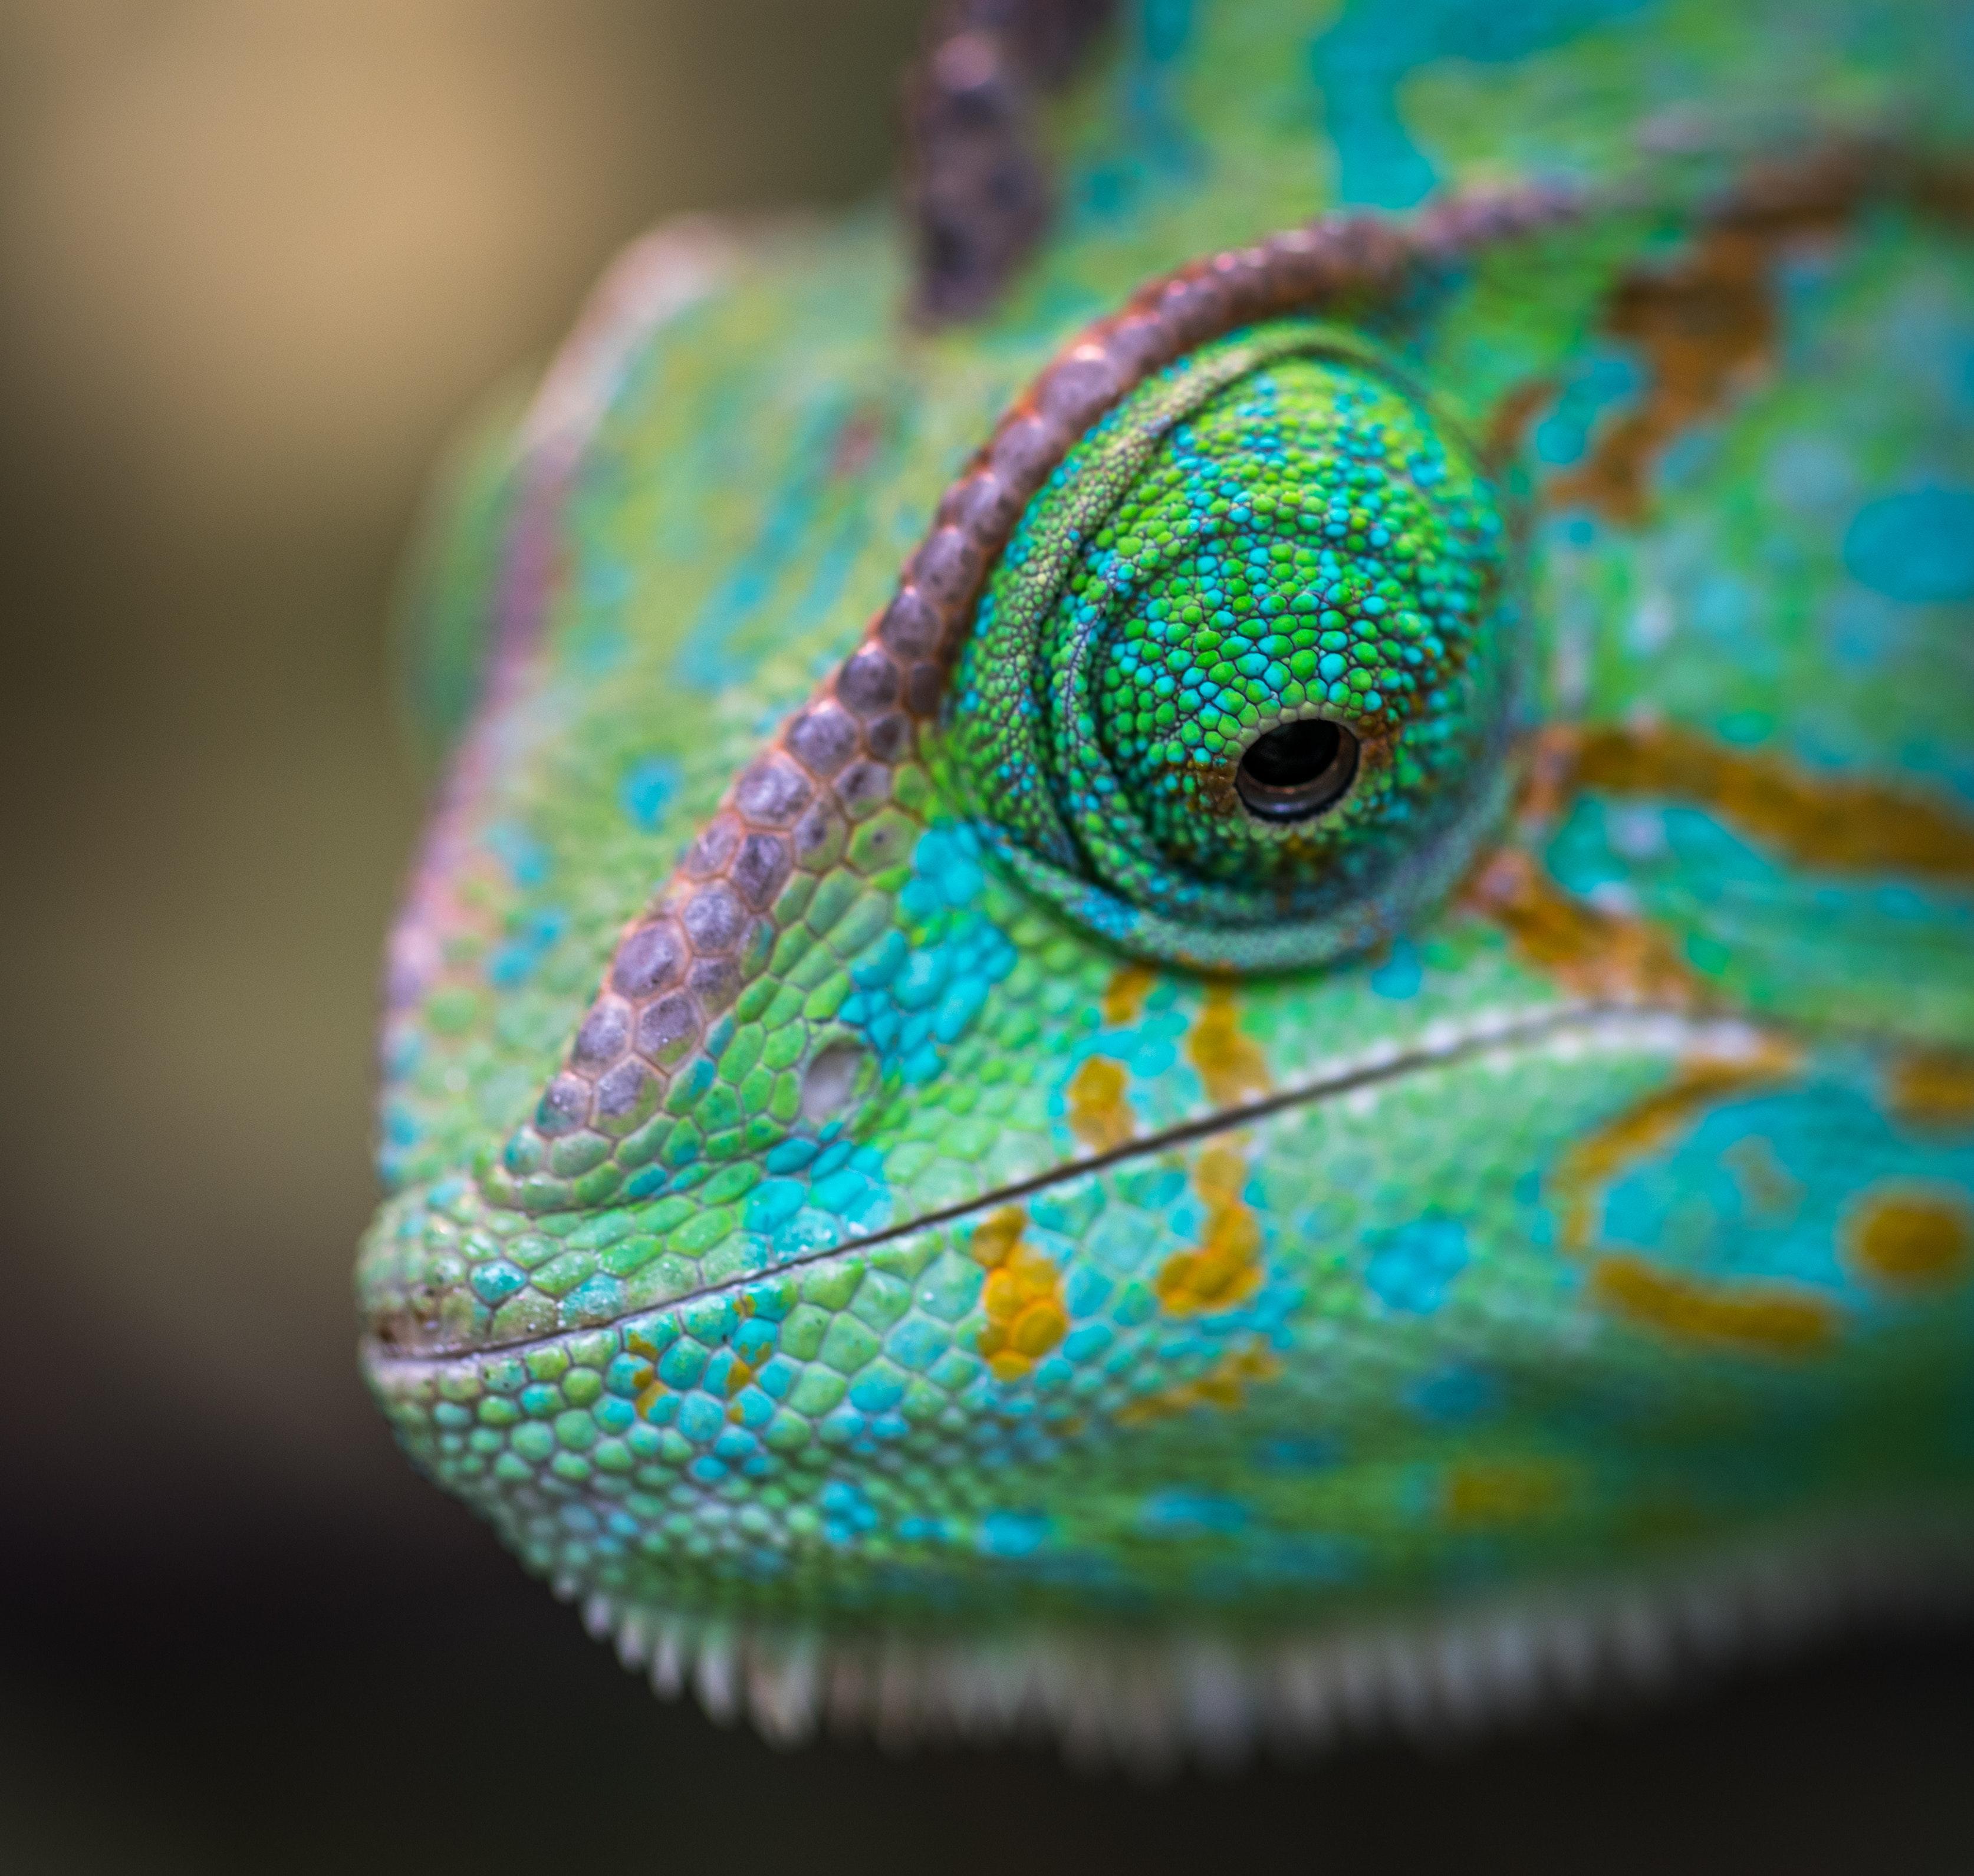 Macro Shot Photography Of Chameleon 183 Free Stock Photo